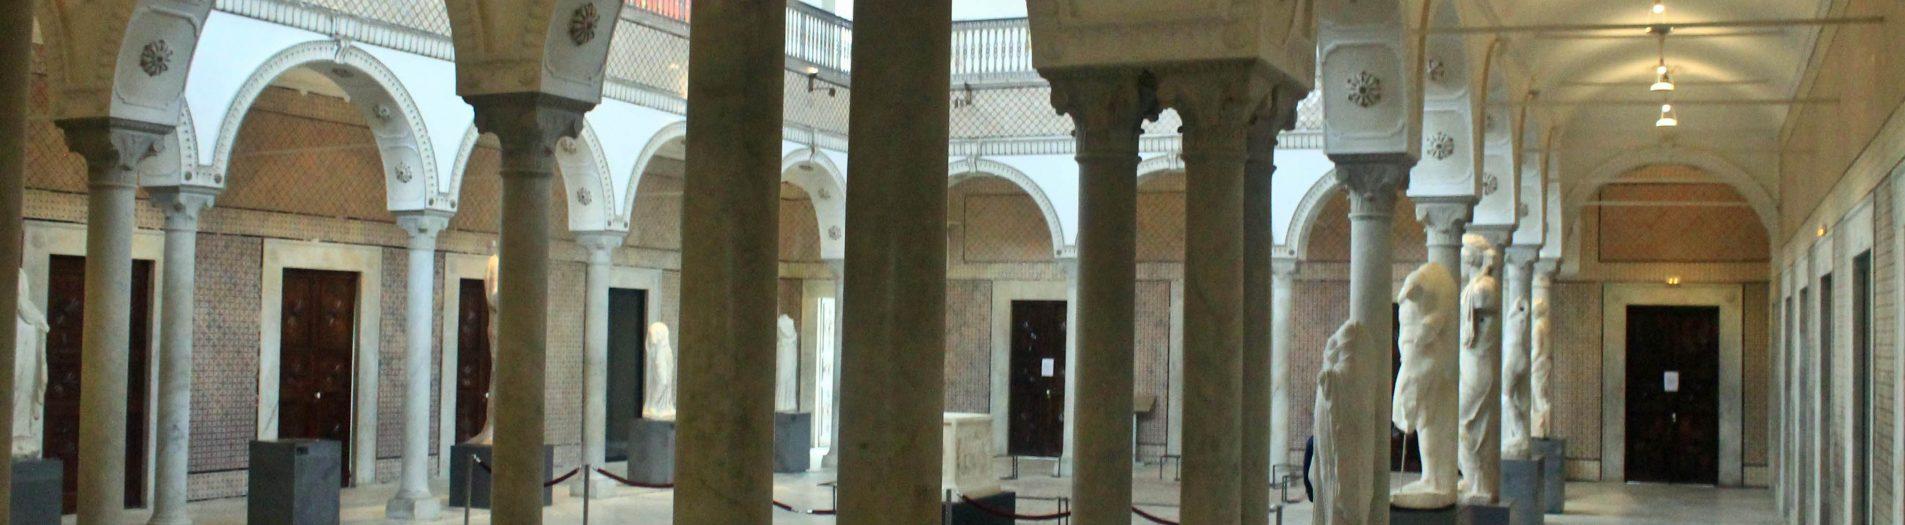 Le palais du Bardo قصر باردو